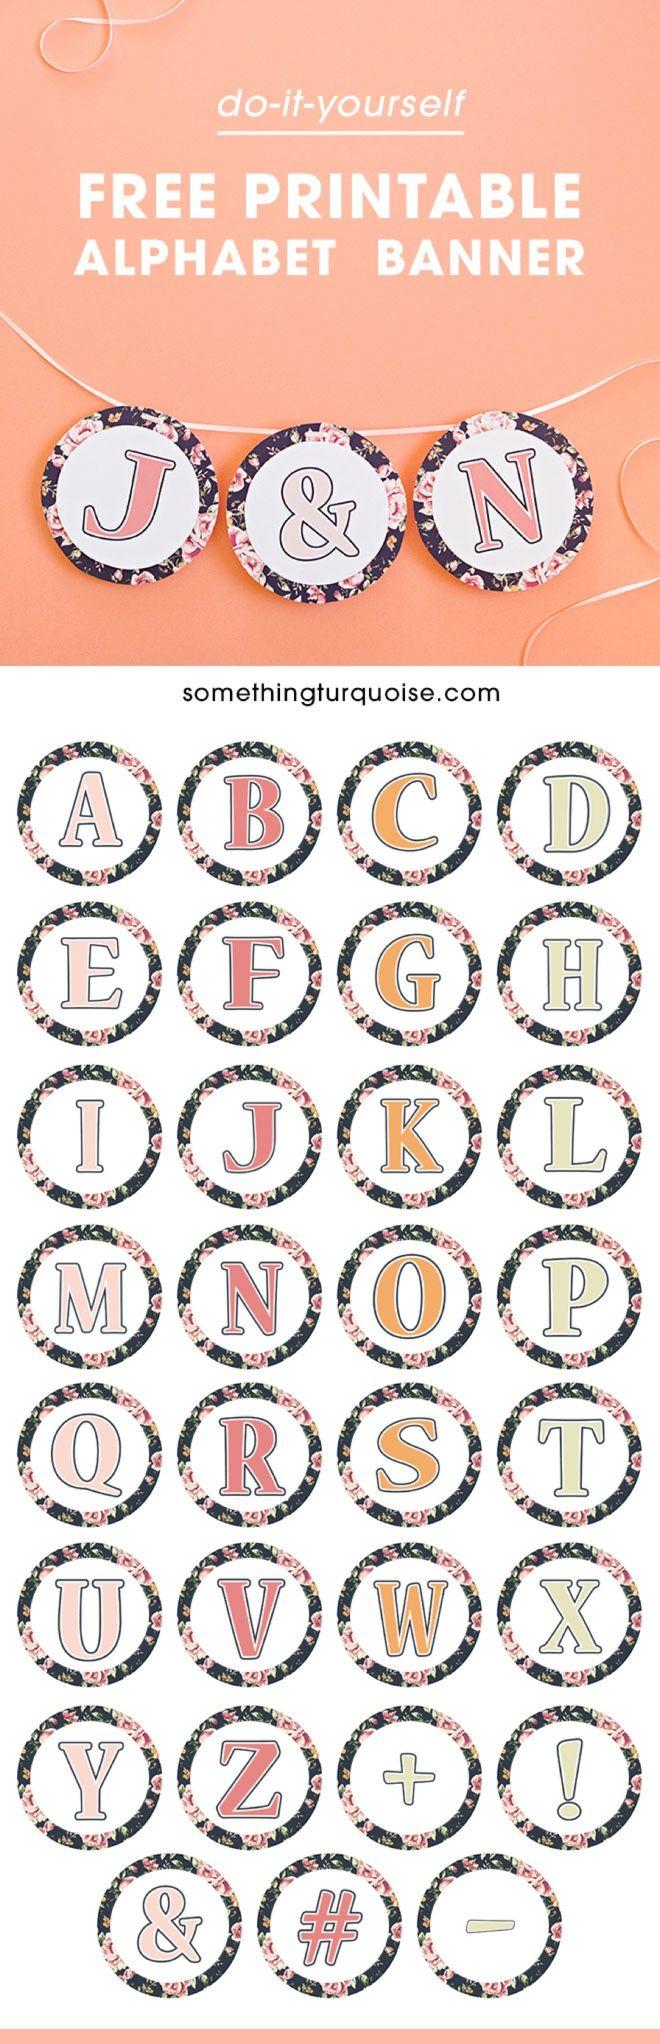 FREE Printable, Floral Design Alphabet and Number Banner ...